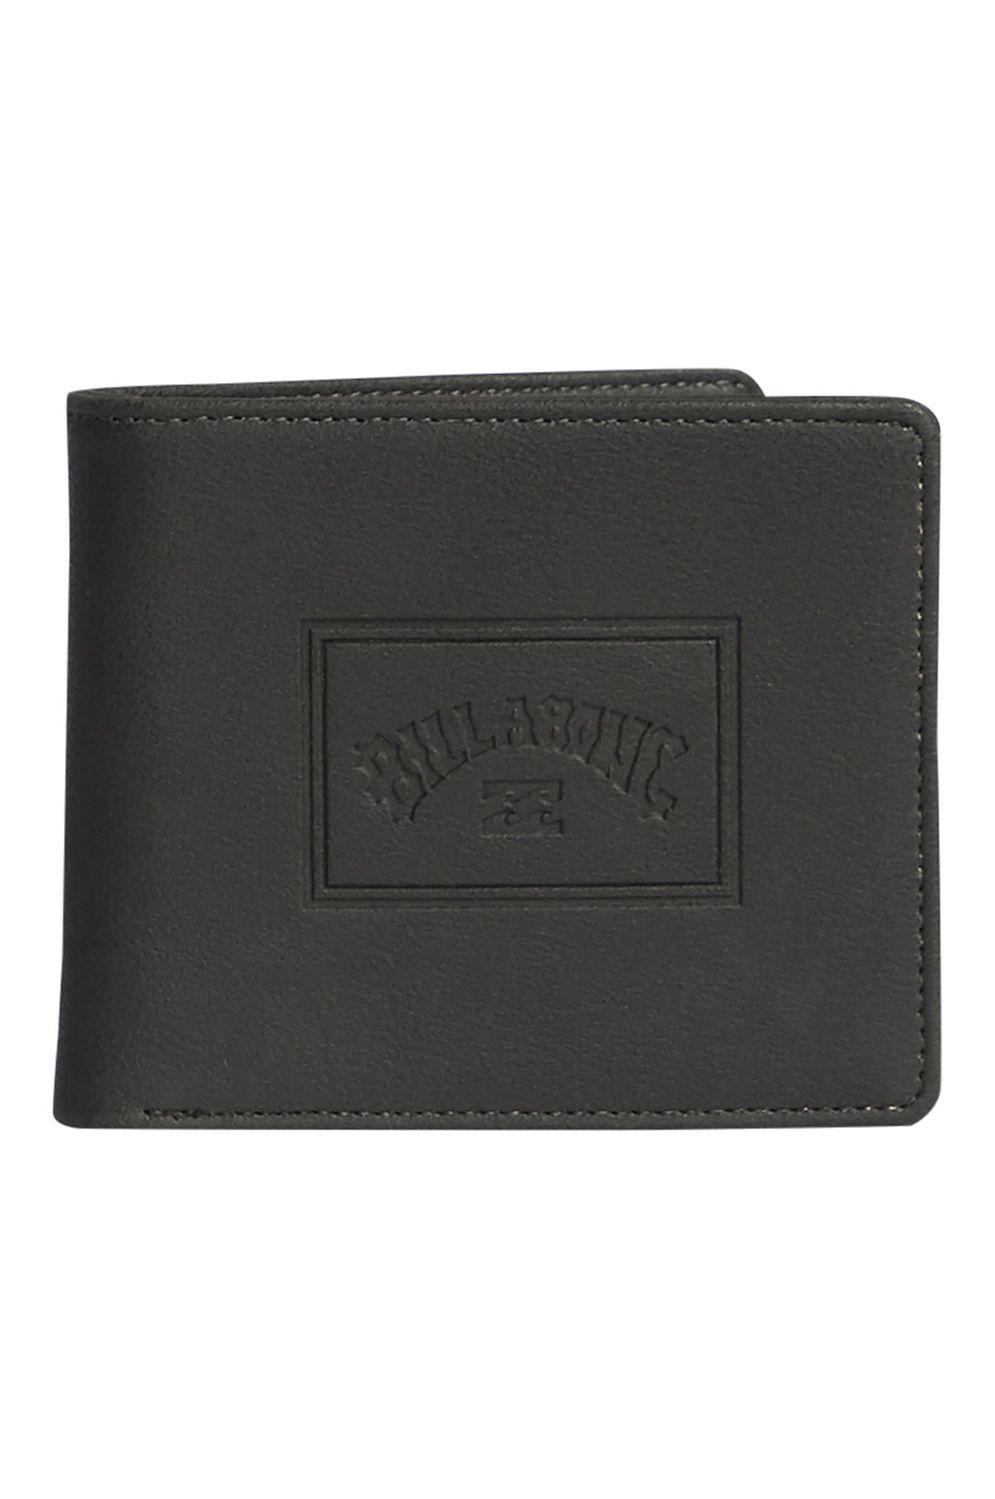 Billabong Wallet ARCHIN Chocolate